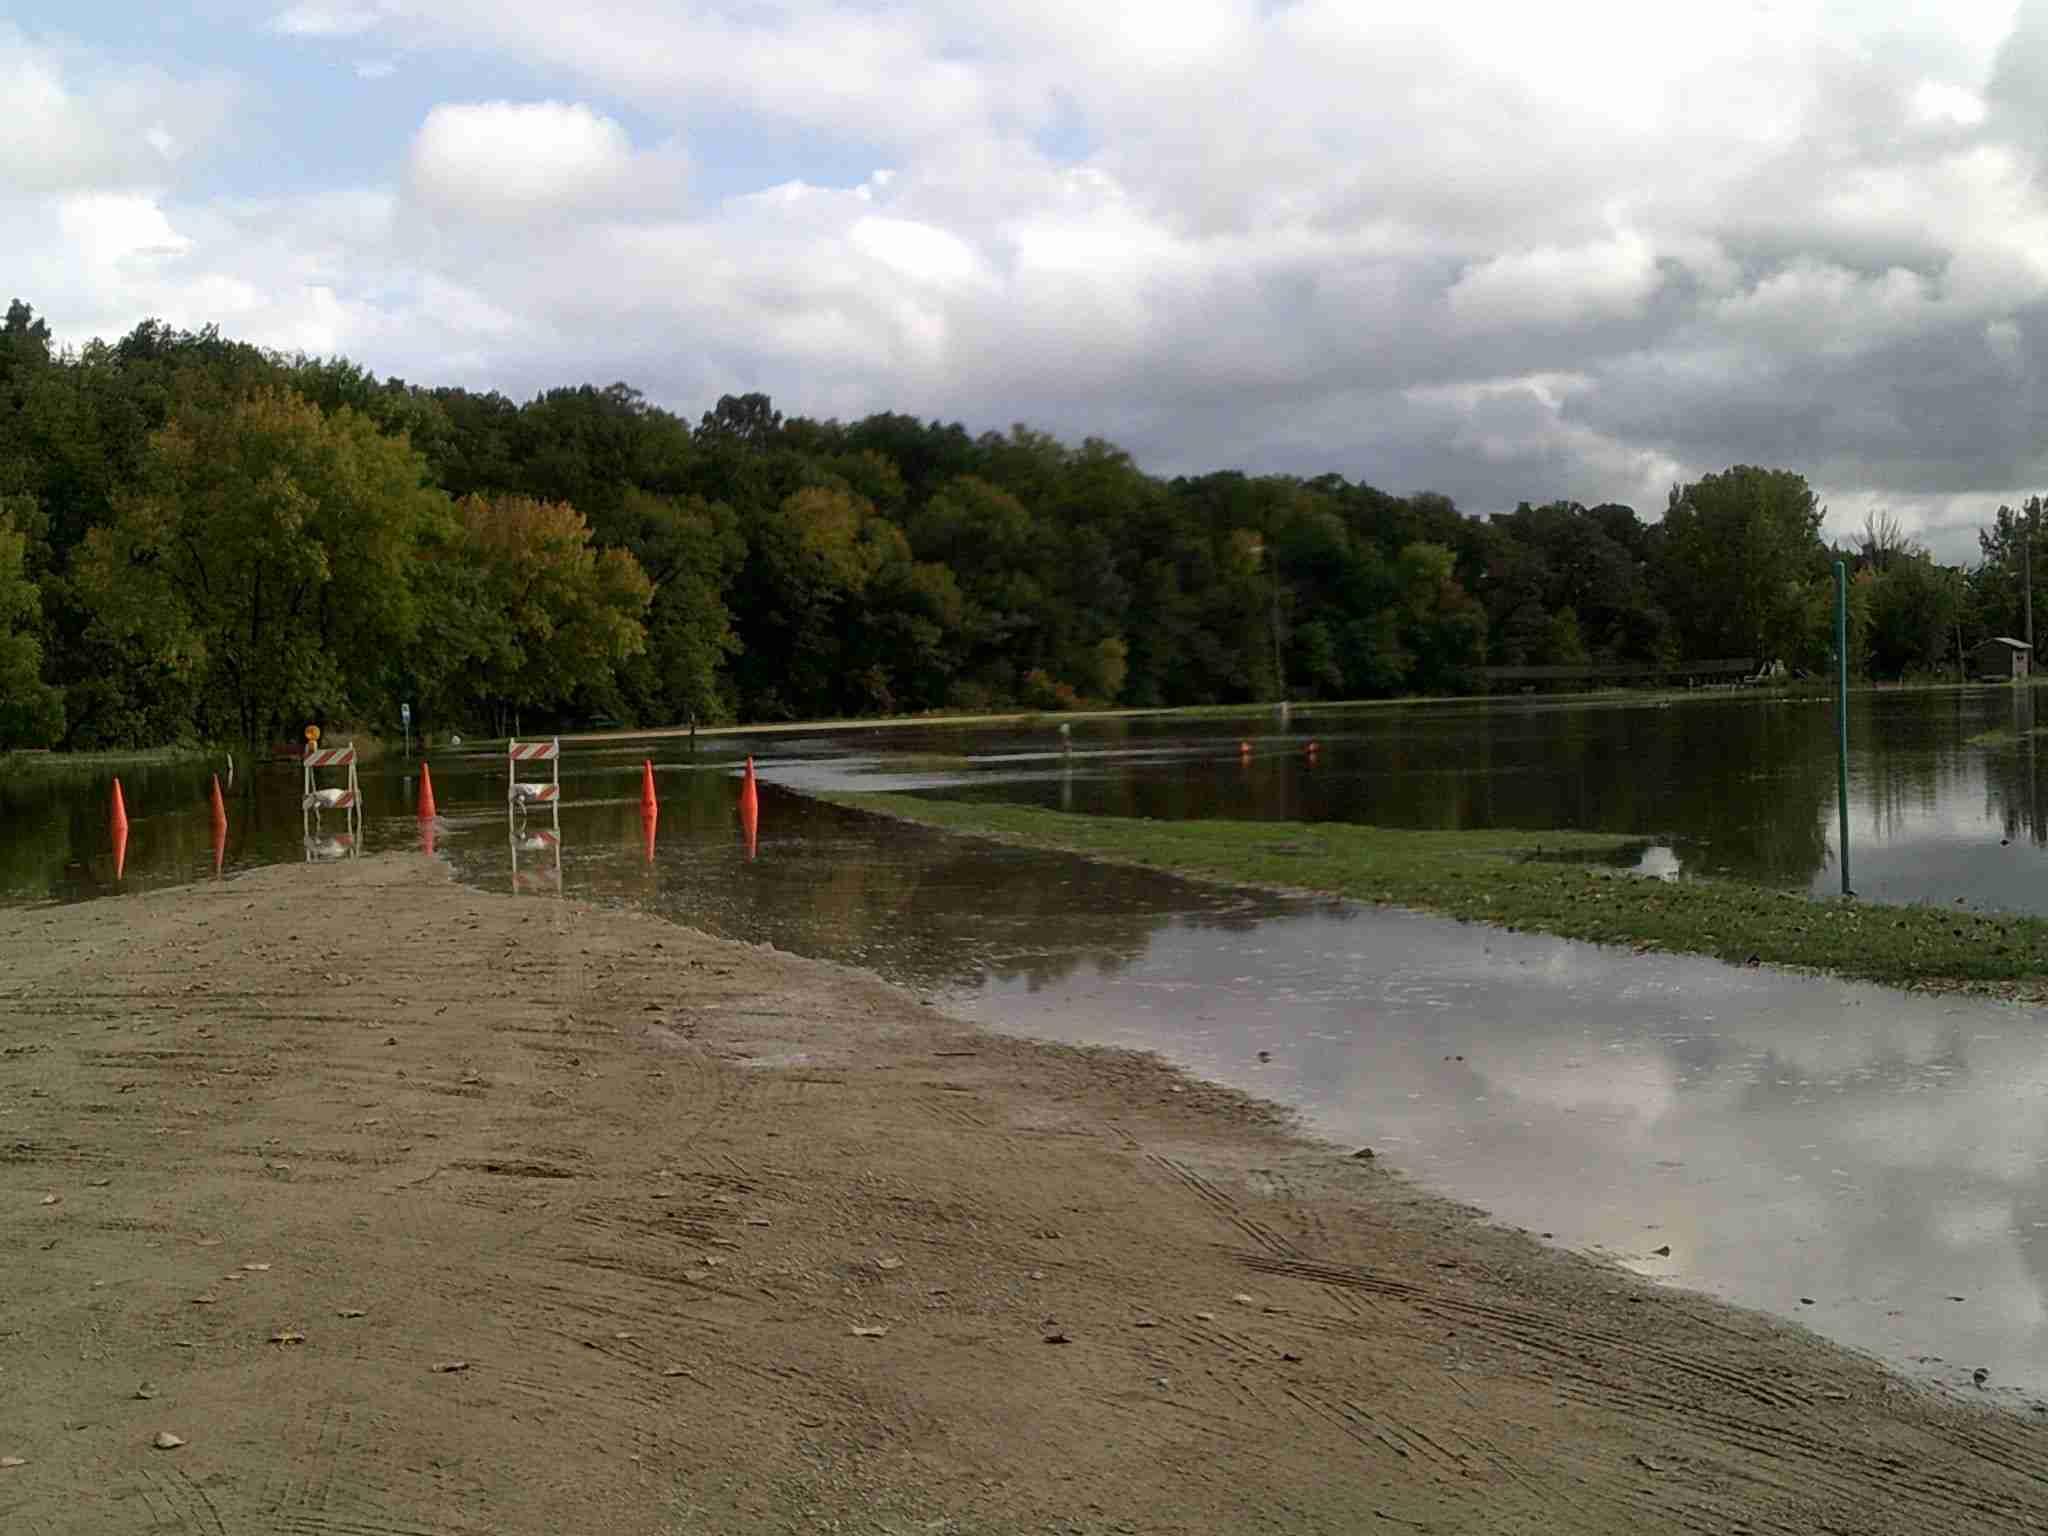 The Winnebago River floods the area bike trail.